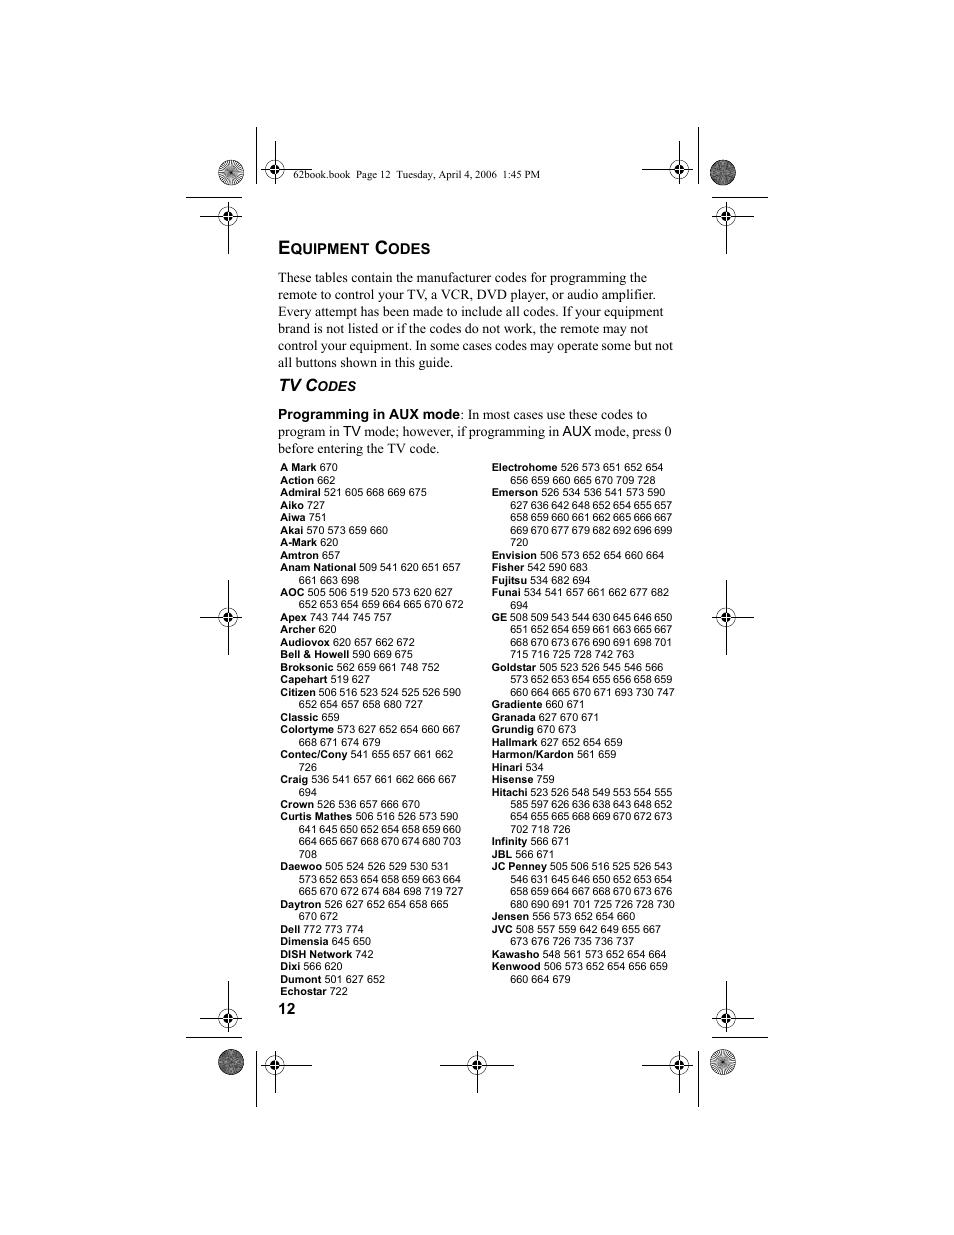 Equipment codes, Ge 12, Tv c   Dish Network DVR 942 User